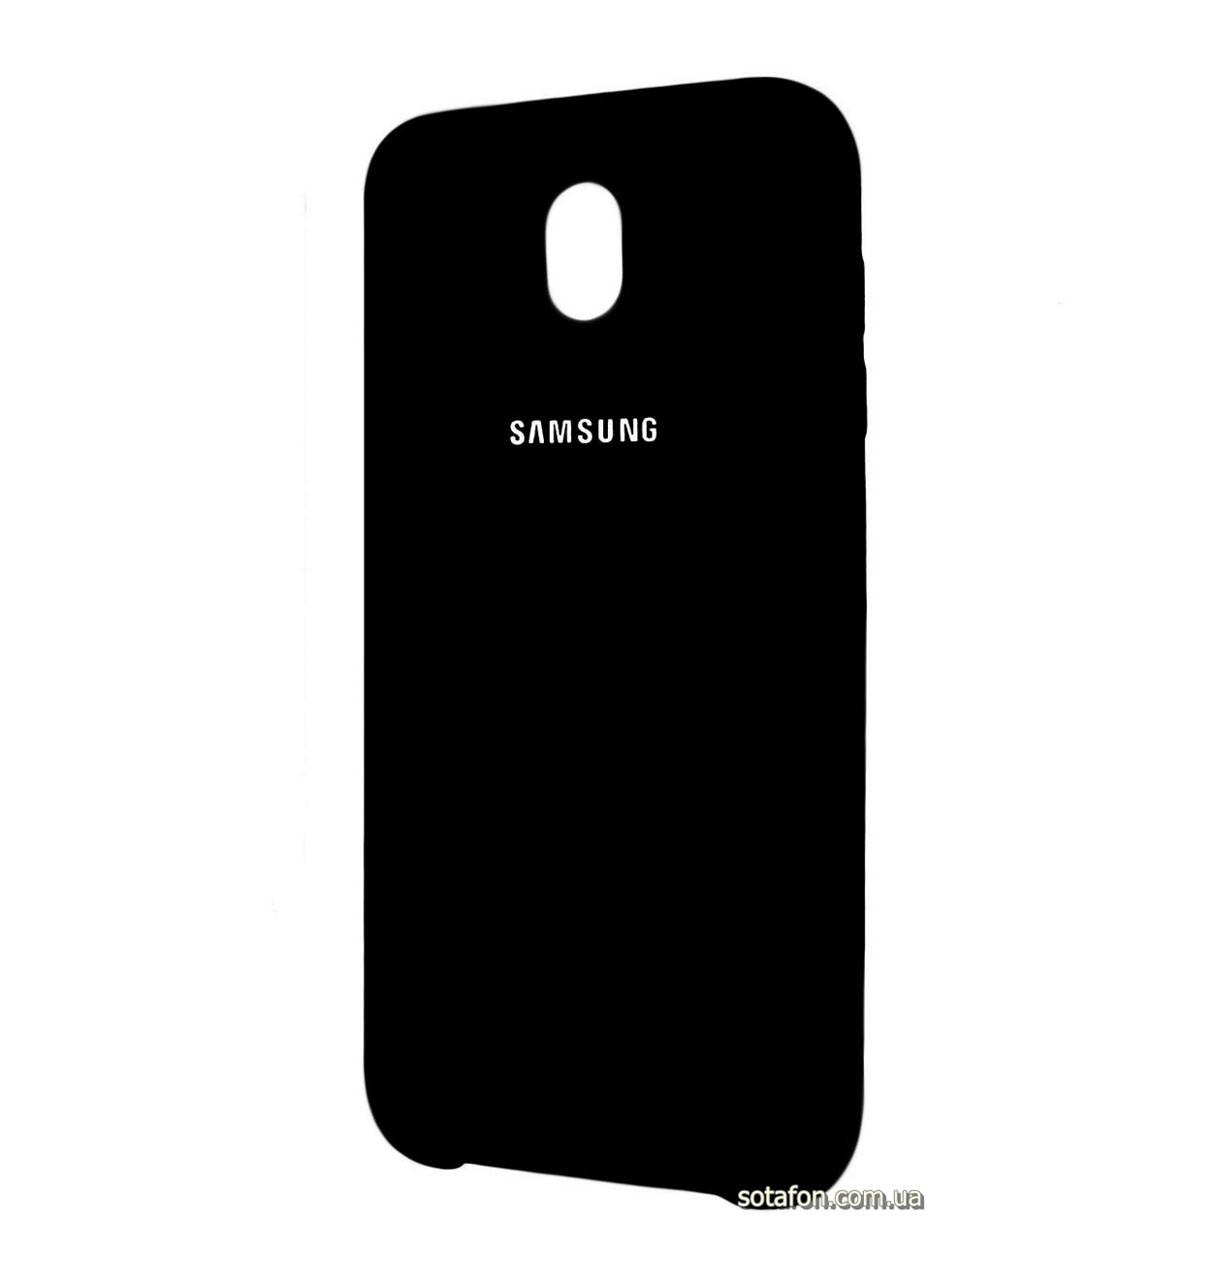 Чехол-накладка Original Silicone case на Samsung Galaxy J3 (2017) SM-J330F Black